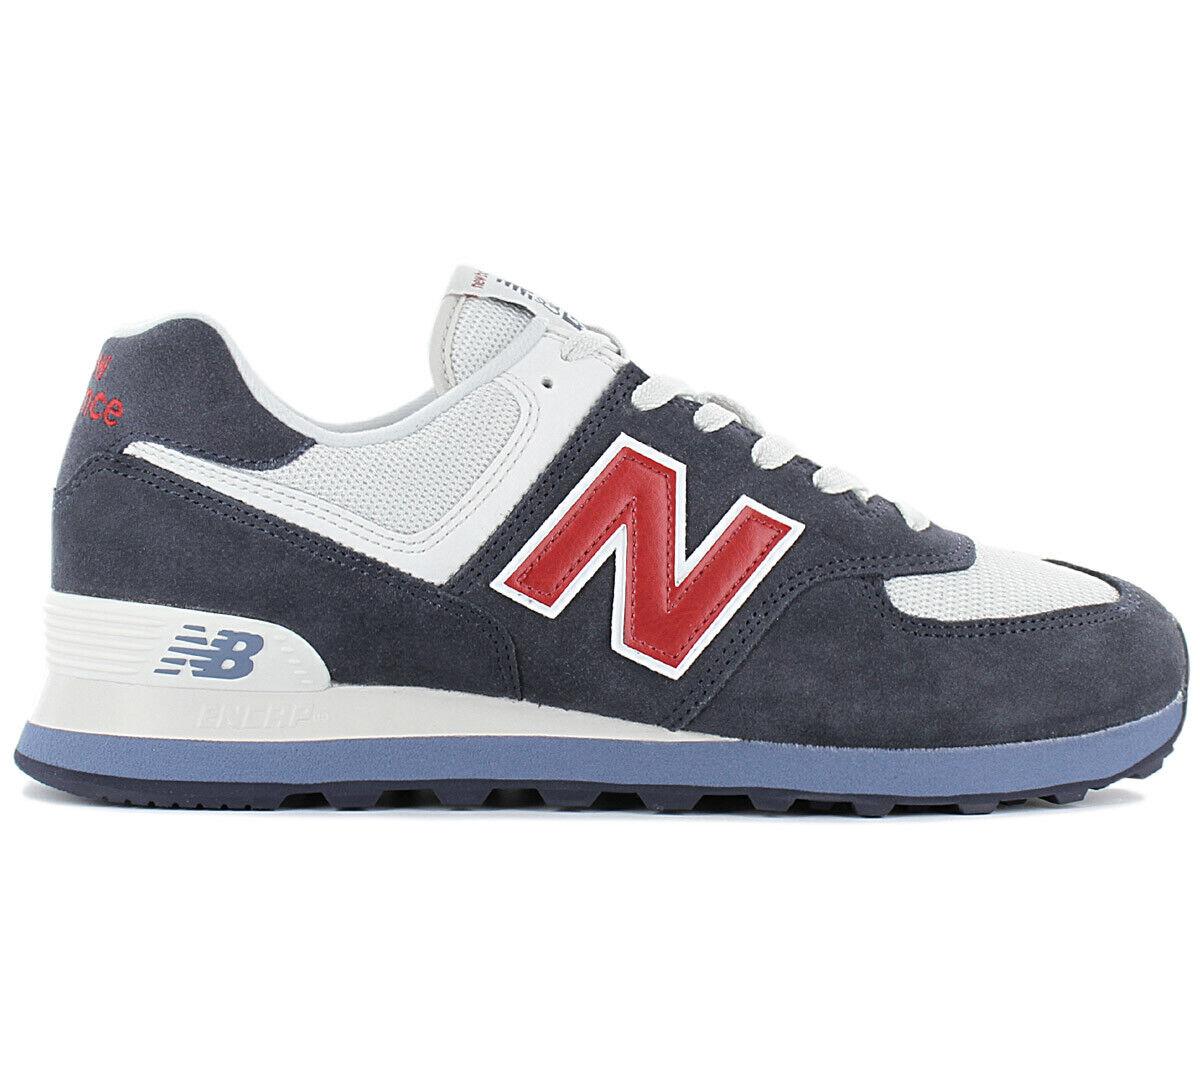 New Balance Classics 574 Men's Sneakers Ml574 Ml574esc shoes Trainers bluee New